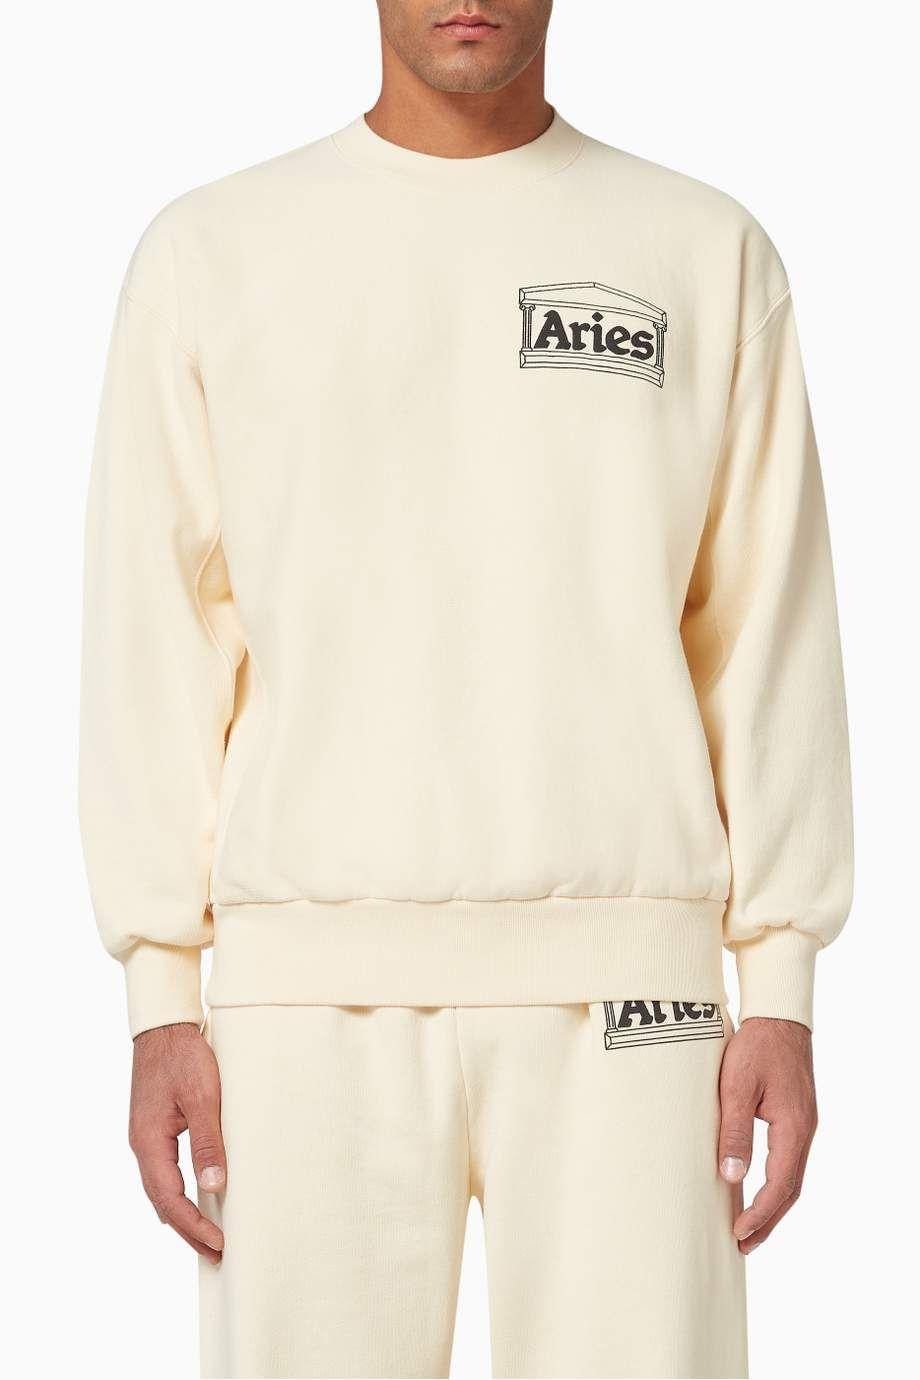 Shop Aries Neutral Temple Premium Cotton Sweatshirt For Men Ounass Uae Cotton Sweatshirts Long Sleeve Tshirt Men Mens Outfits [ 1380 x 920 Pixel ]